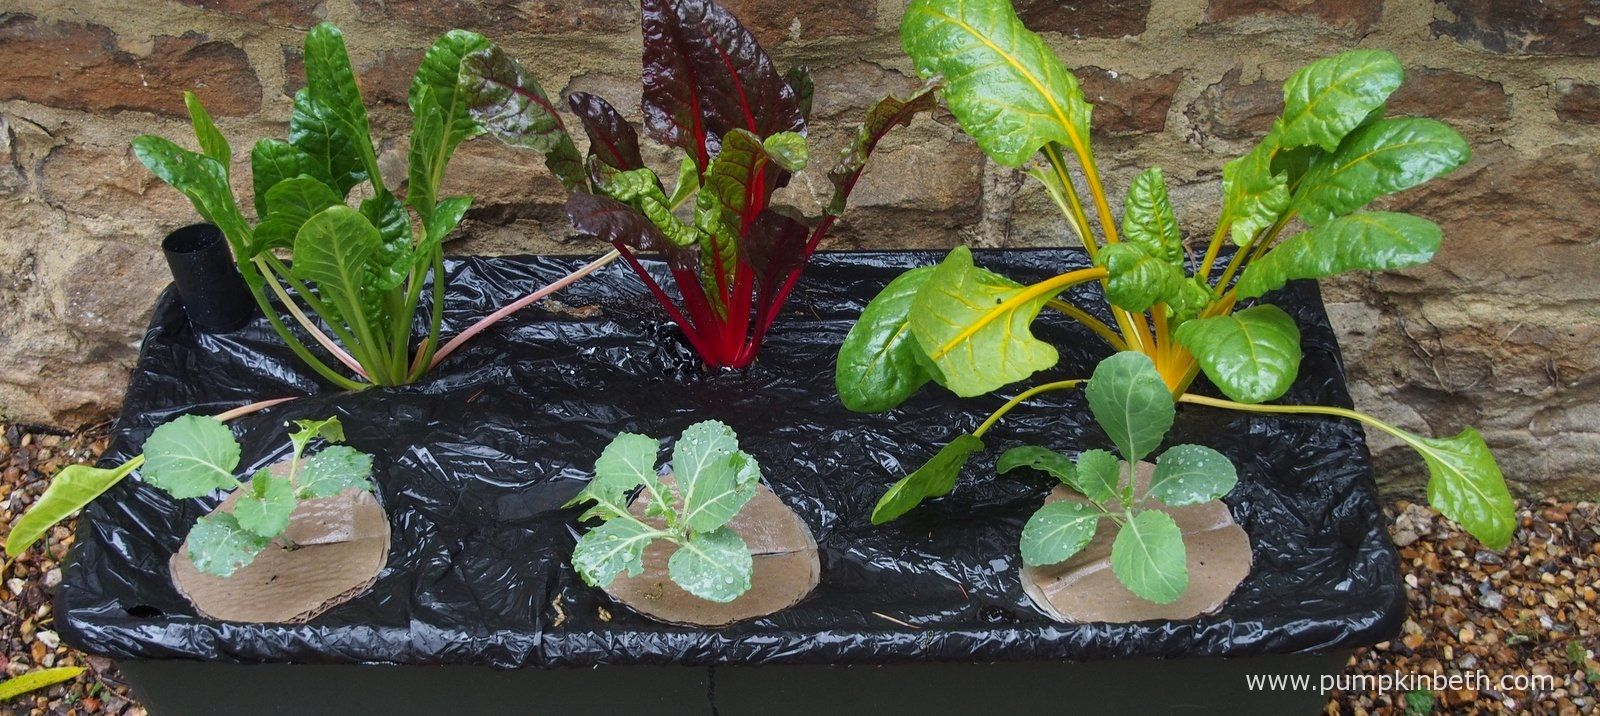 EarthBox Review Organic gardening catalogue, Earthbox